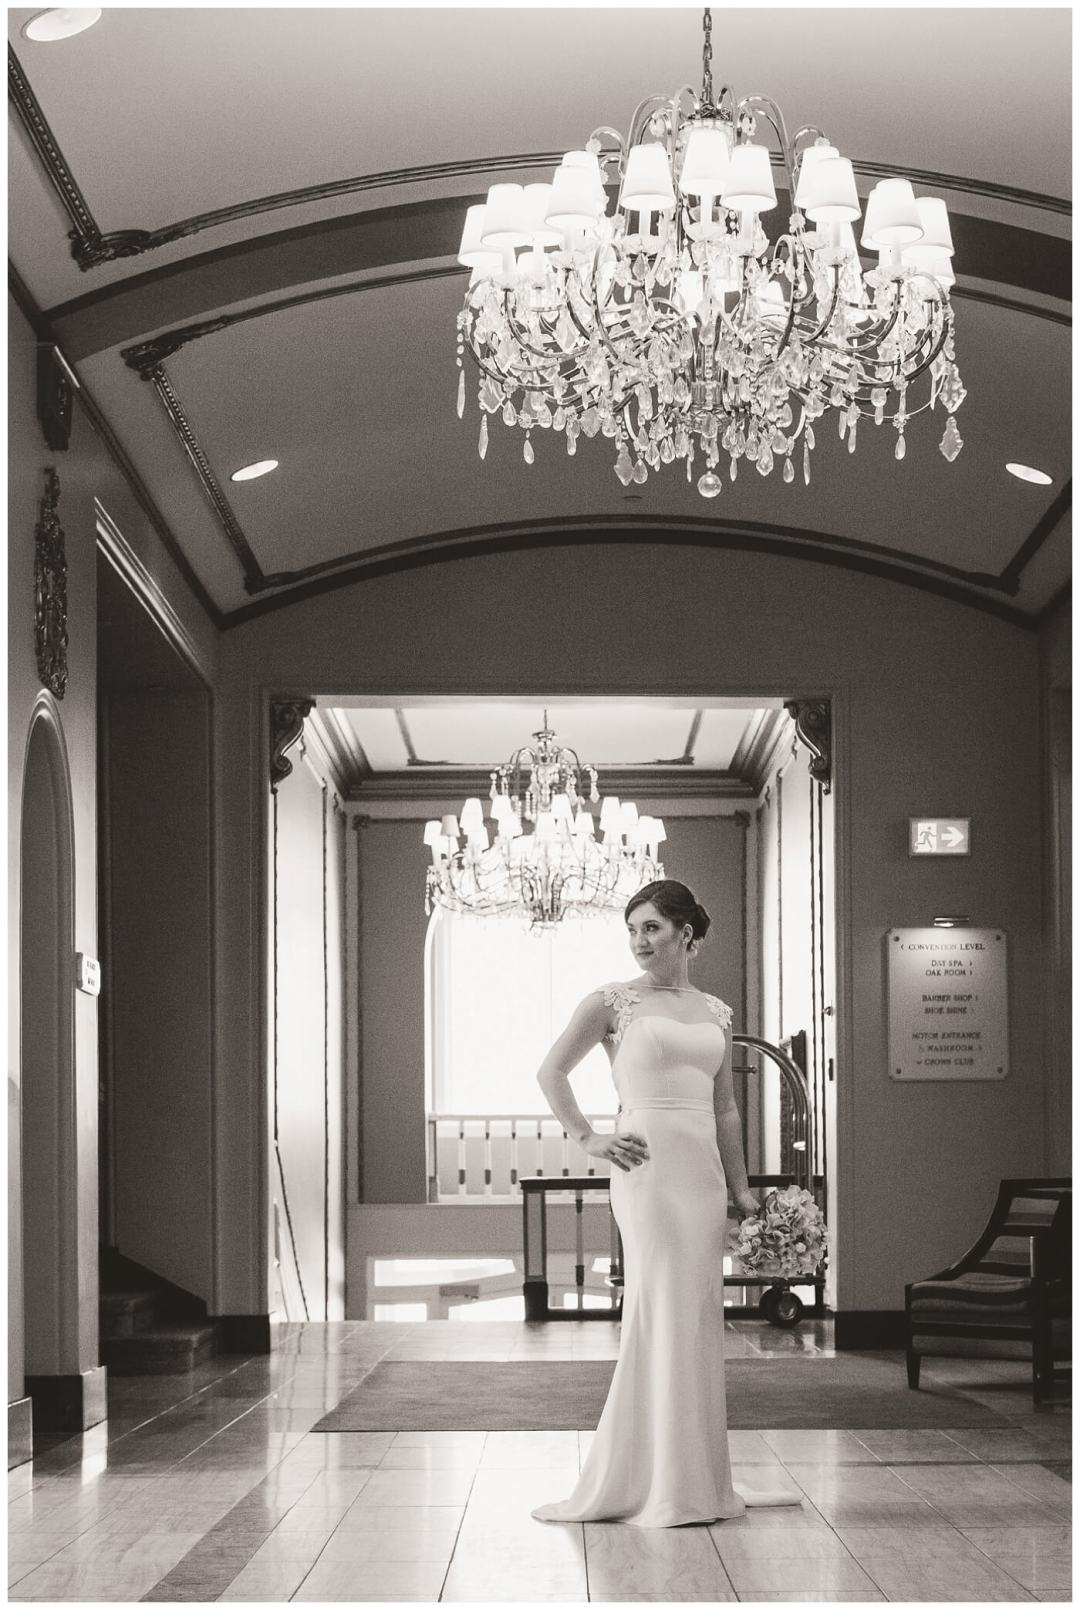 Mark & Kyra - Wedding - 09 - Kyra - Bride in Hotel Sask Lobby